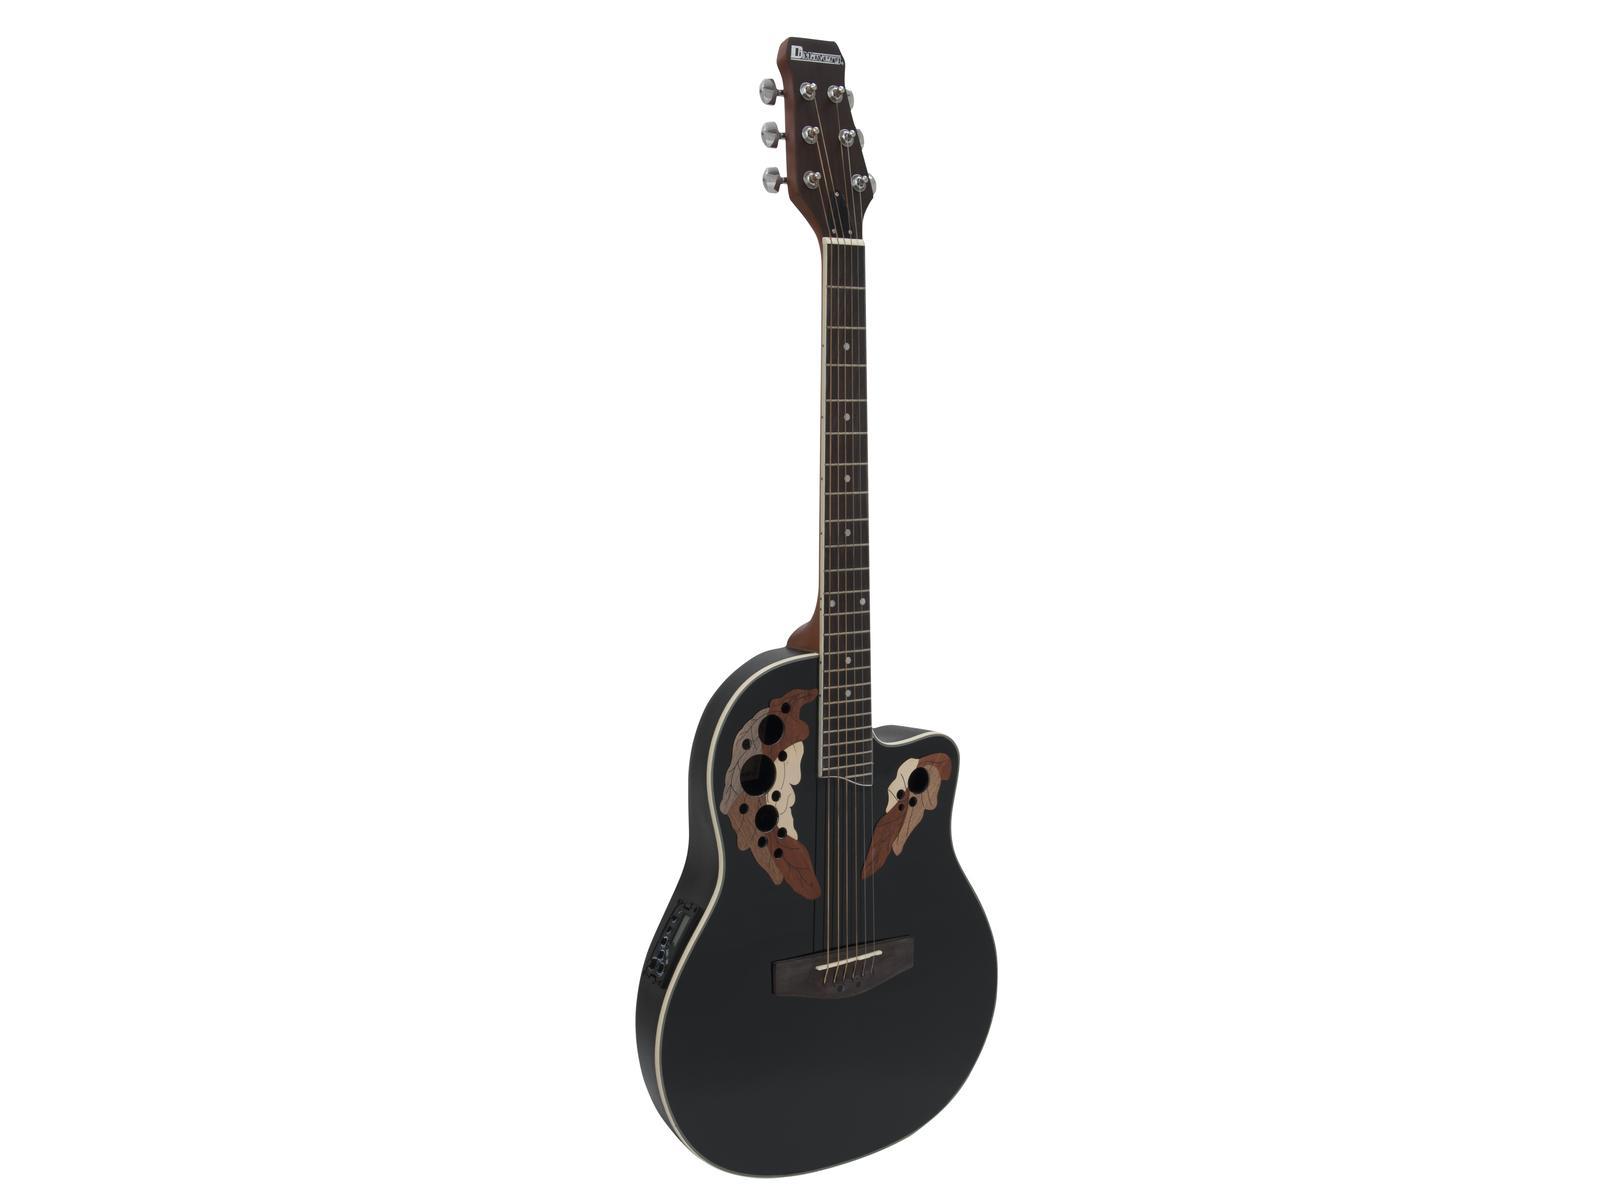 Dimavery OV-500, kytara elektroakustická typu Ovation, černá